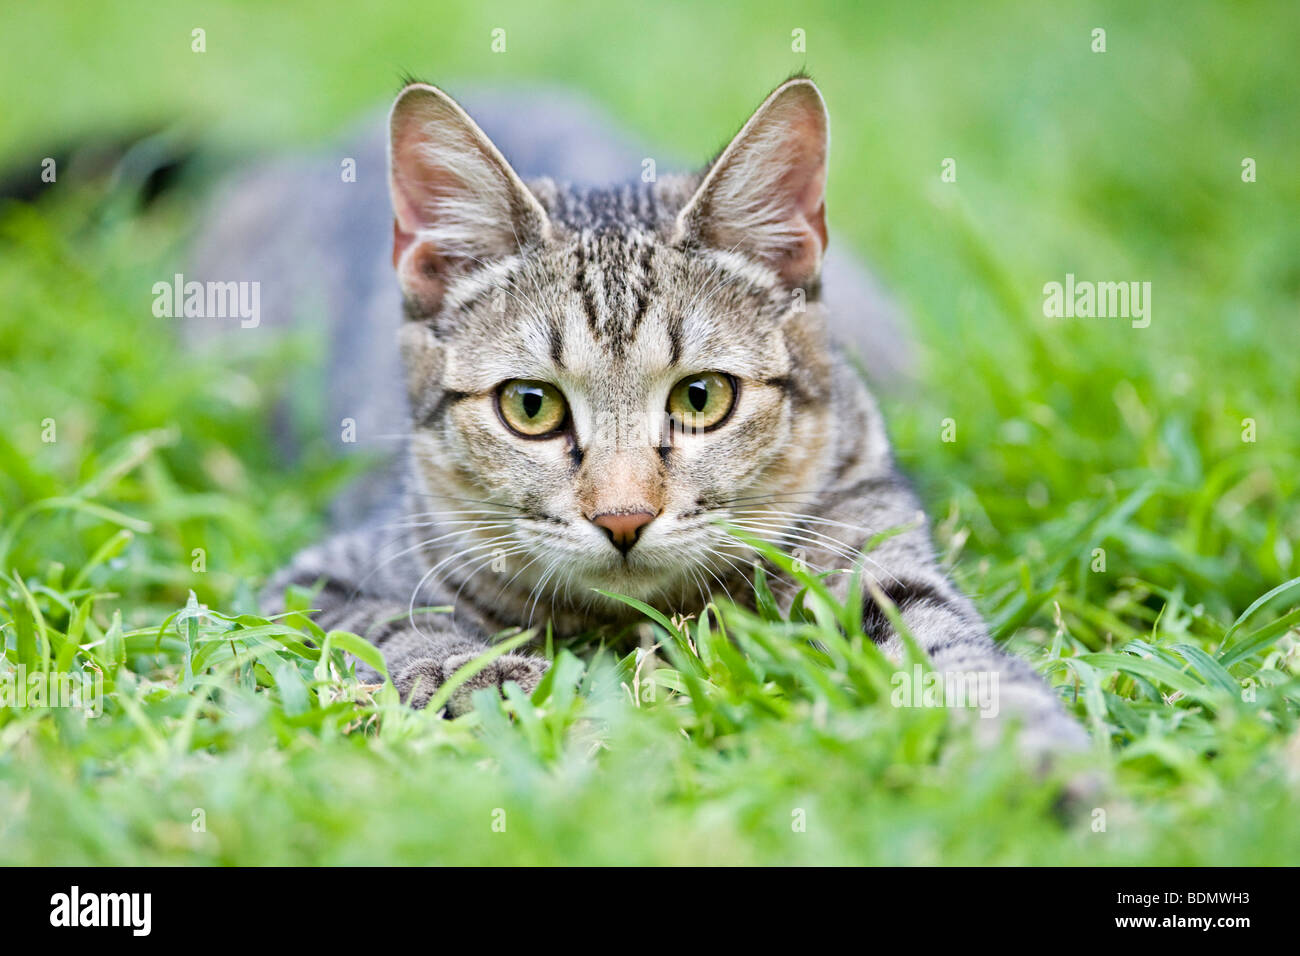 Striped cat in grass, Botswana, Africa - Stock Image